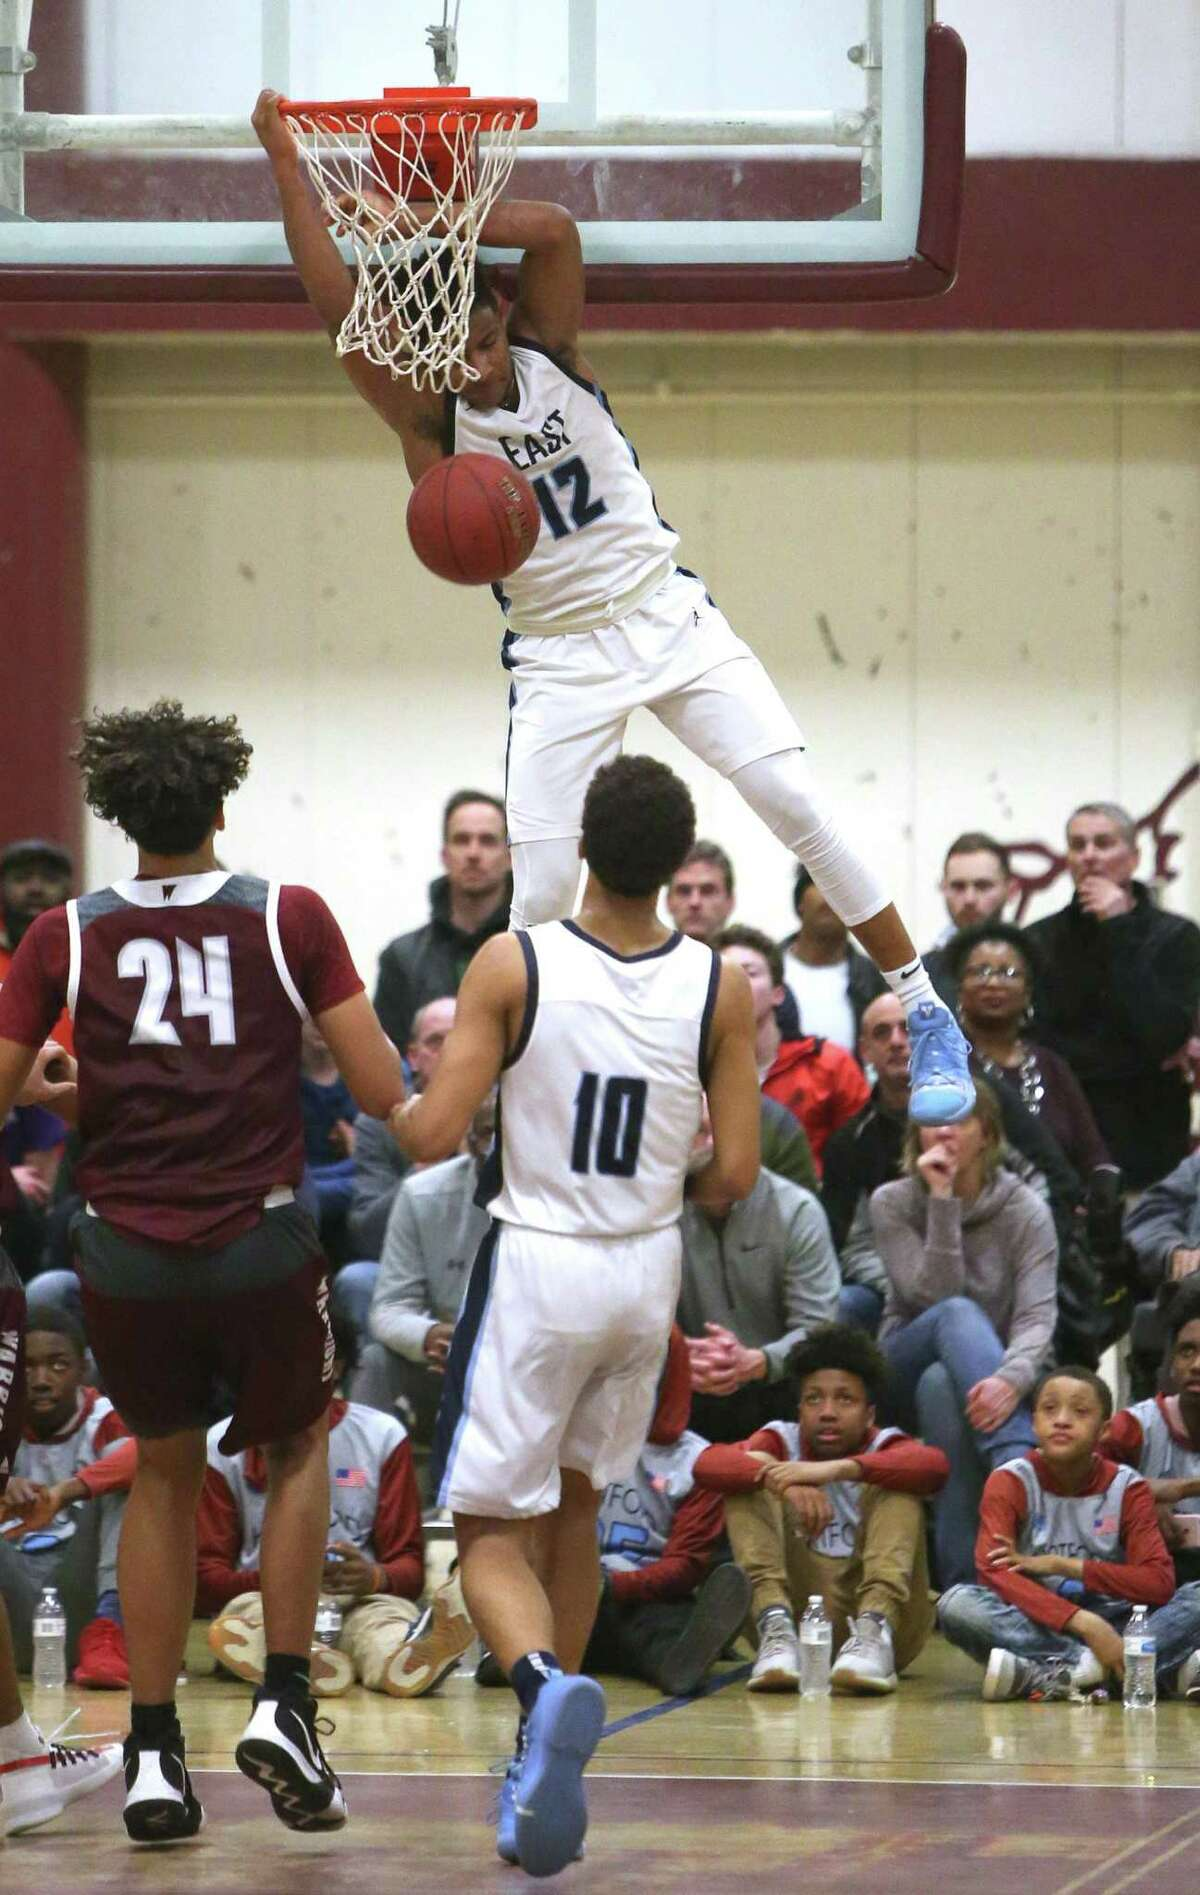 East Catholic's Jaylin Hunter dunks the ball during the CCC boys basketball tournament final against Windsor.